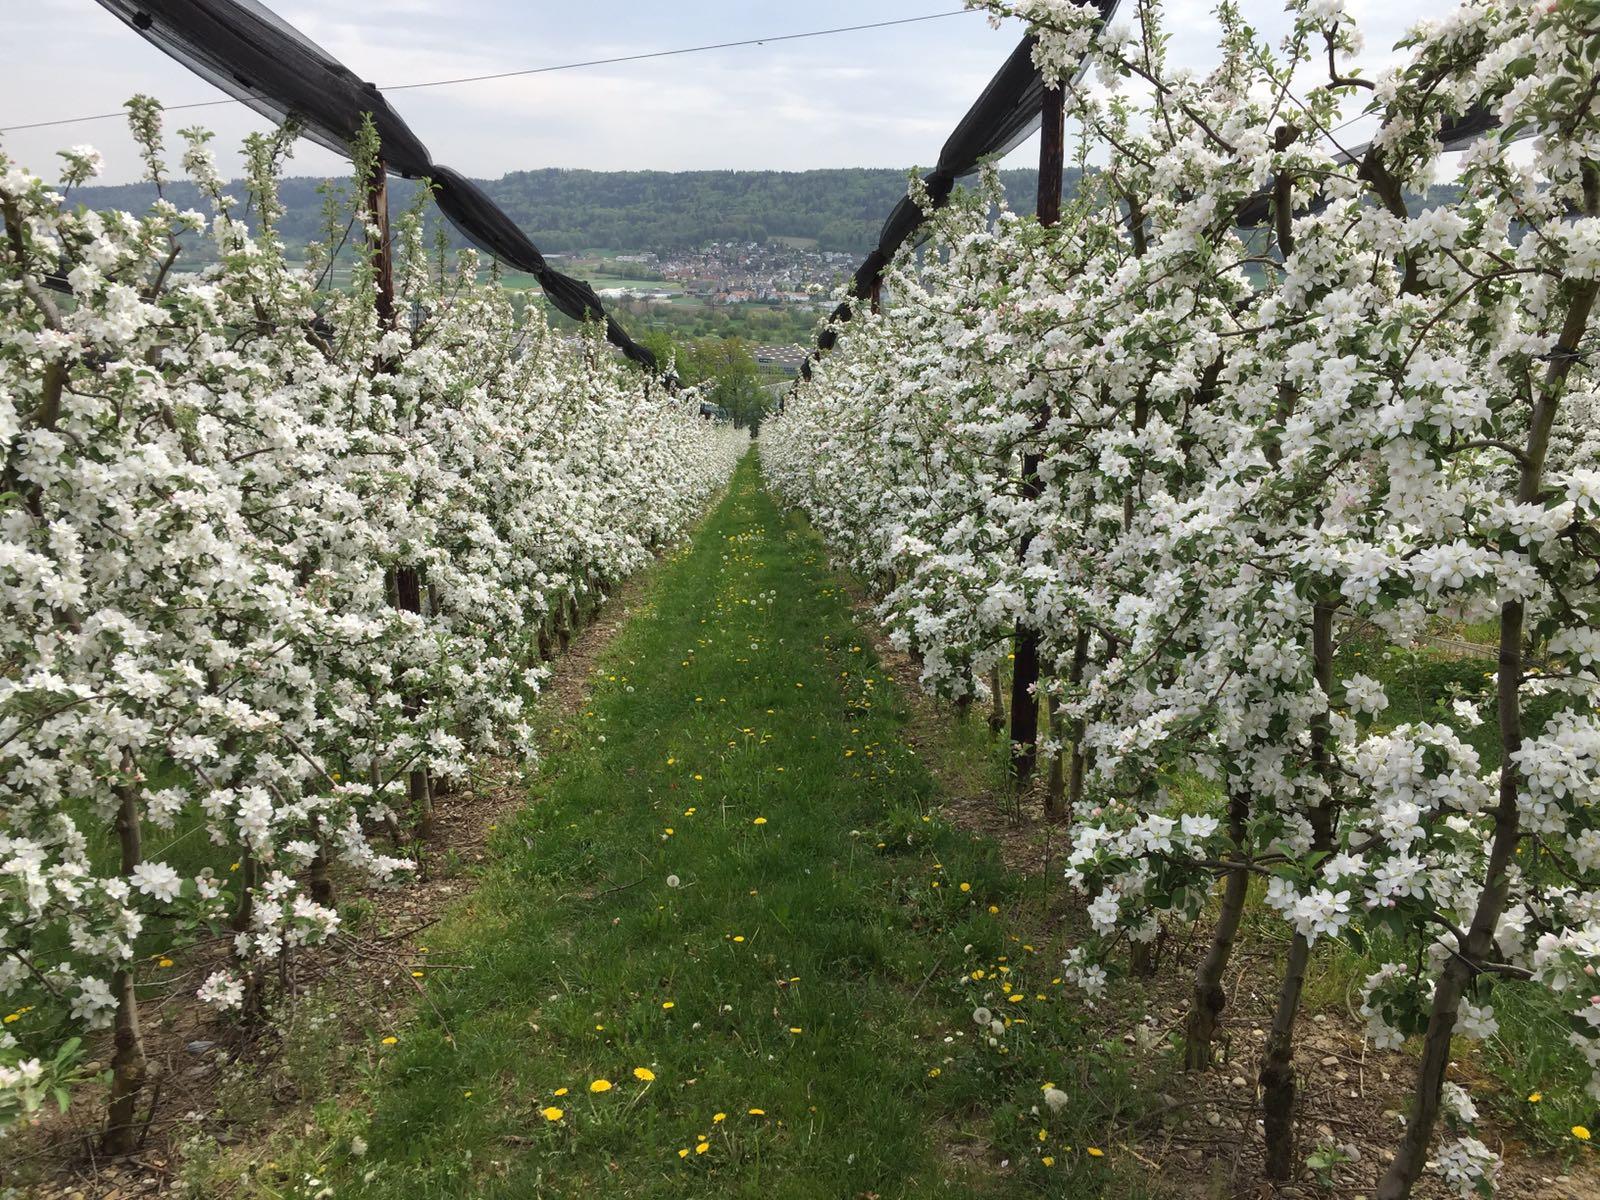 Apfelblüte reihe [1]